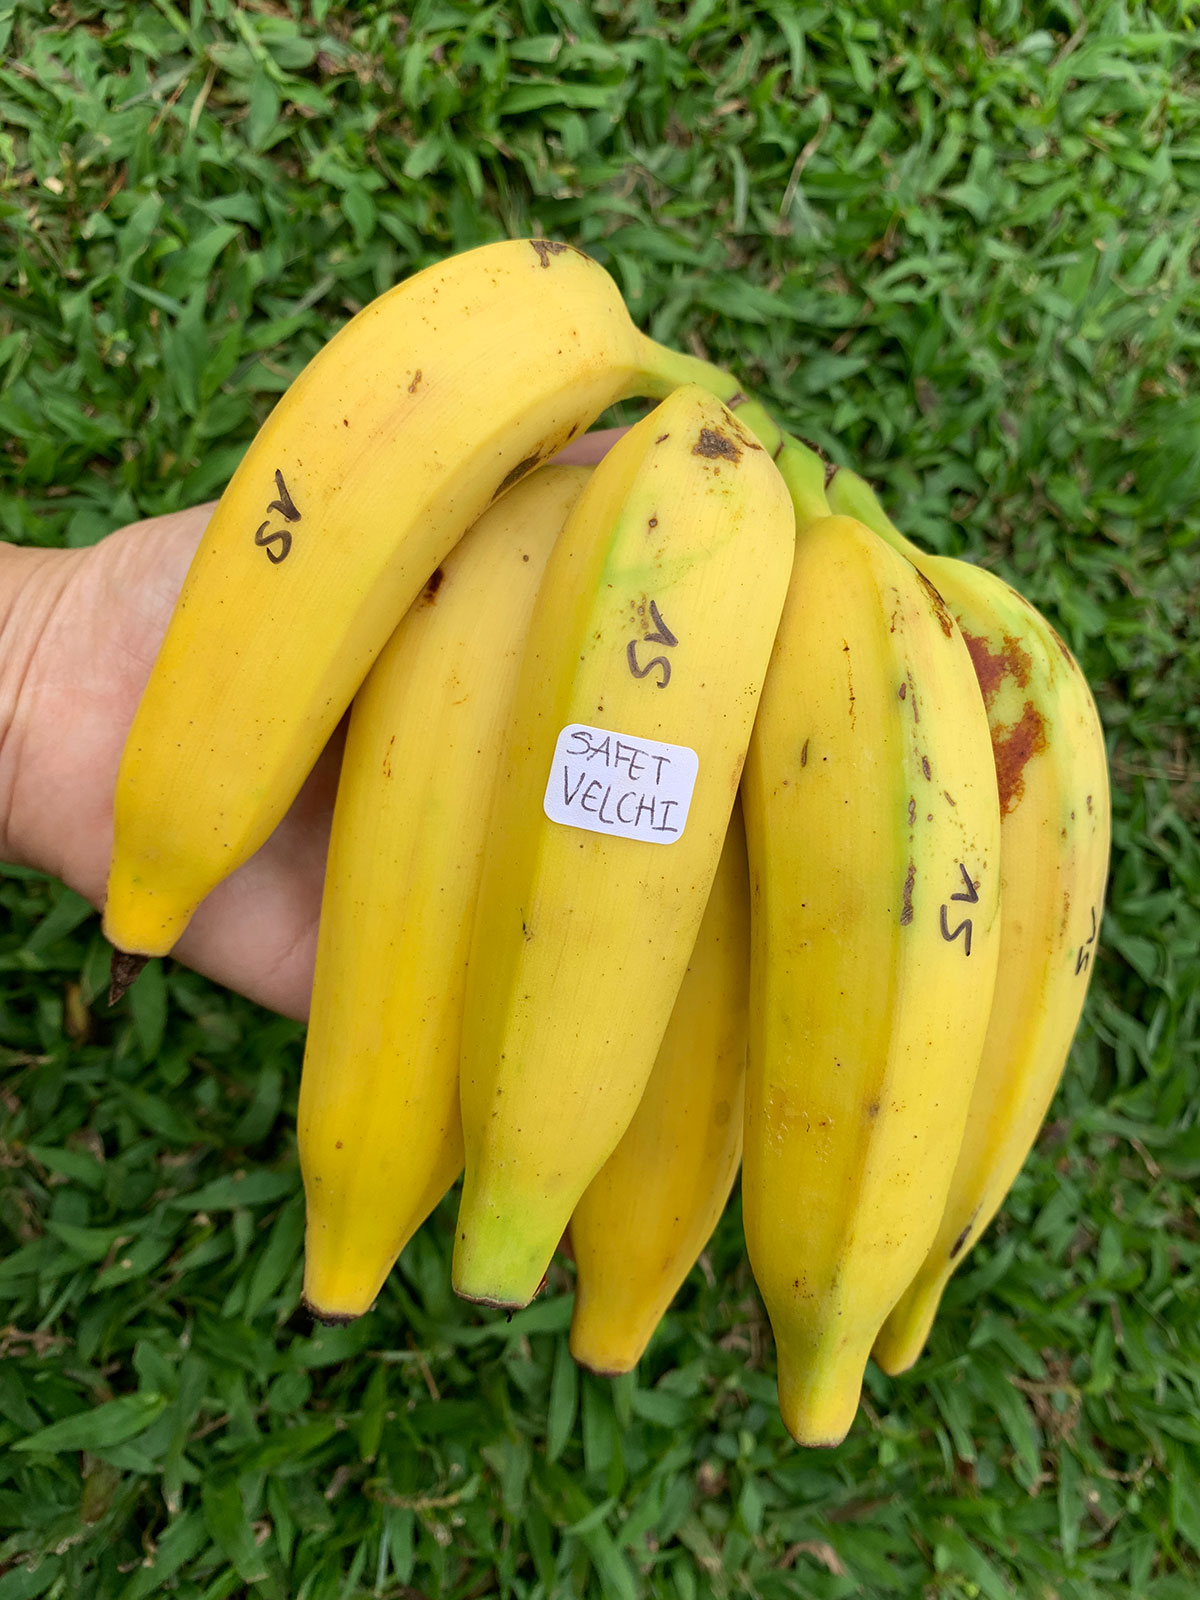 Banana Source Safet Velchi Photo Christi Young